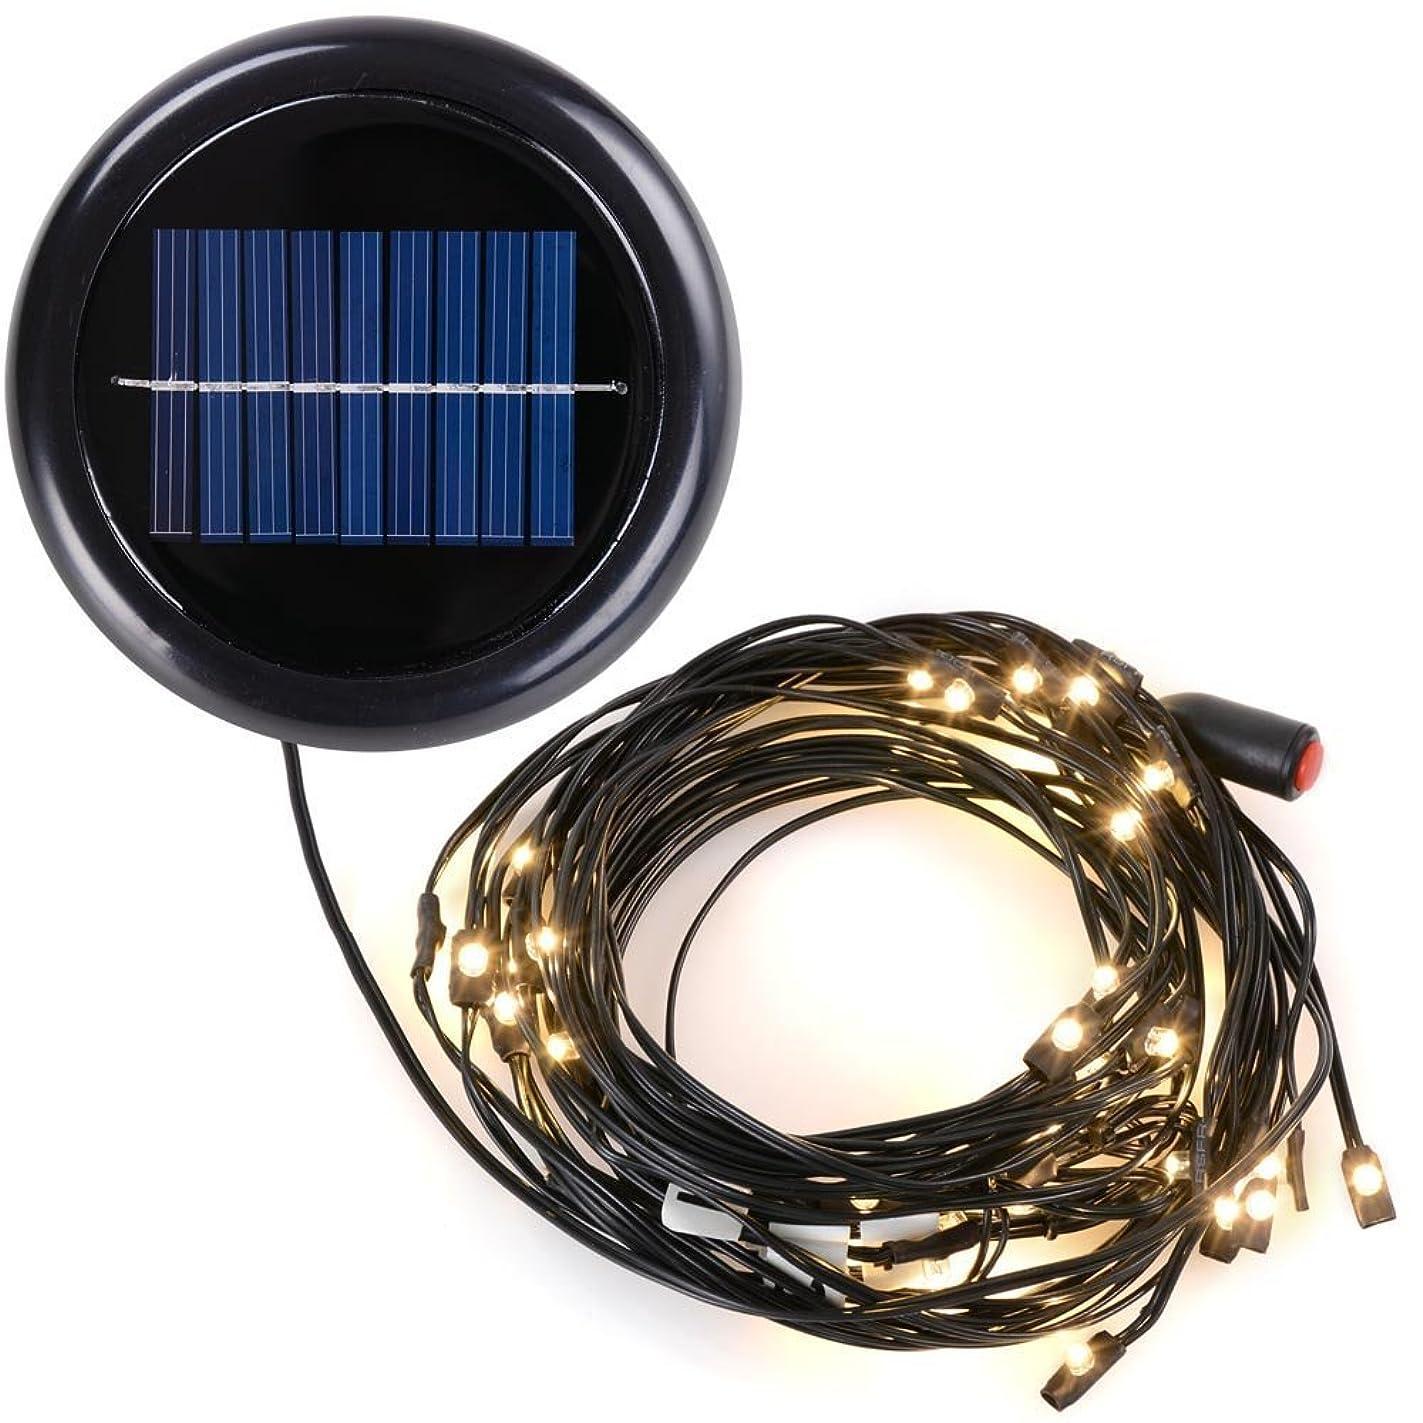 AMPERSAND SHOPS 10-Ft. 8-Rib Outdoor Patio Umbrella Solar-Powered LED String Lights (Warm White)